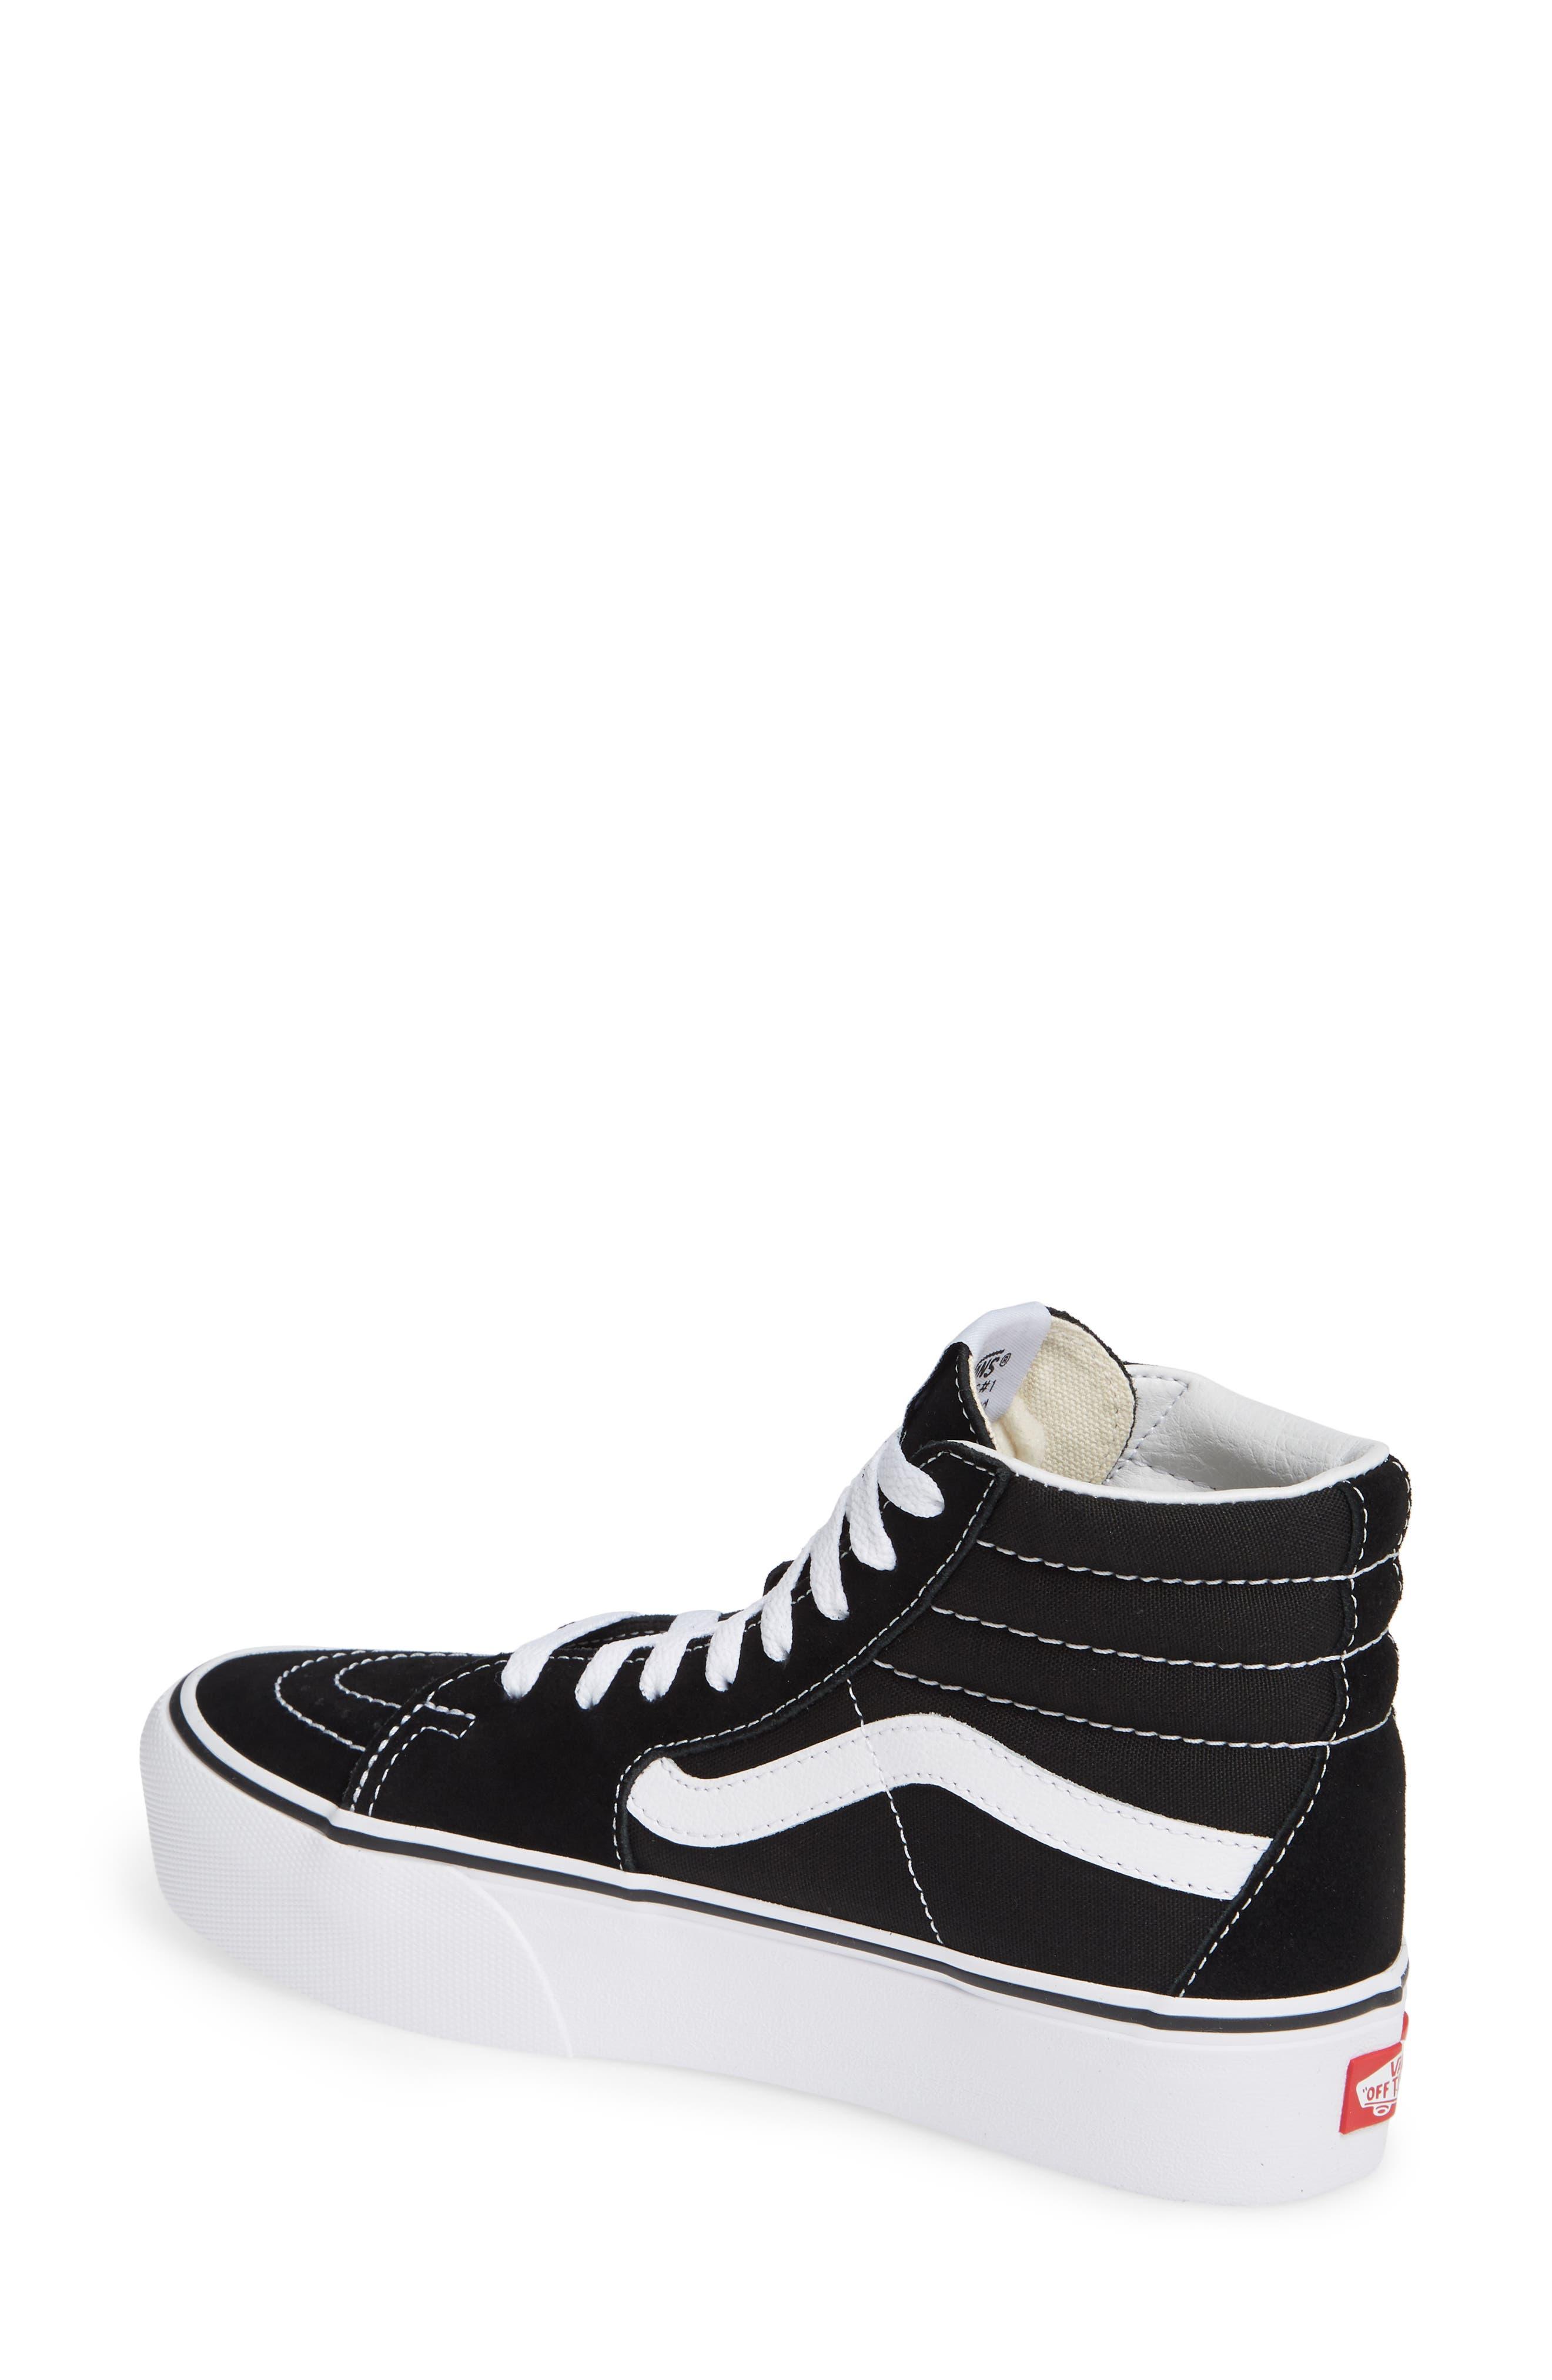 VANS, Sk8-Hi Platform Sneaker, Alternate thumbnail 2, color, BLACK/ TRUE WHITE